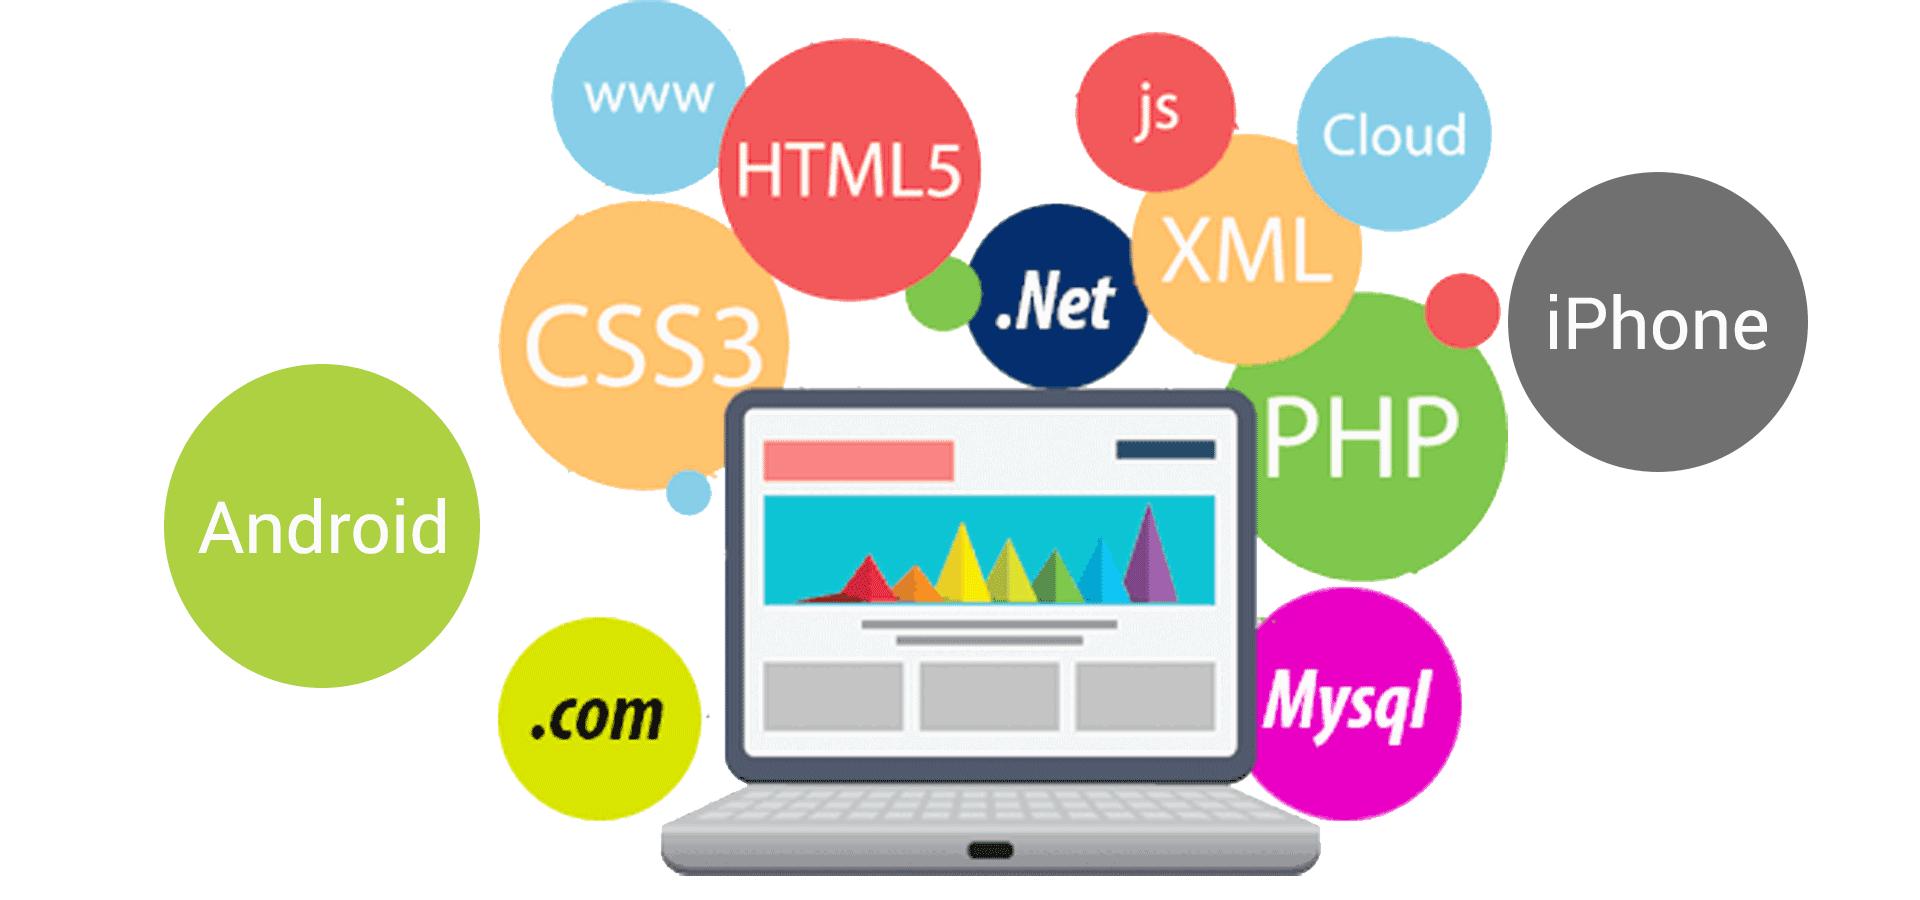 Professional Website Development Company For Better Online Presence